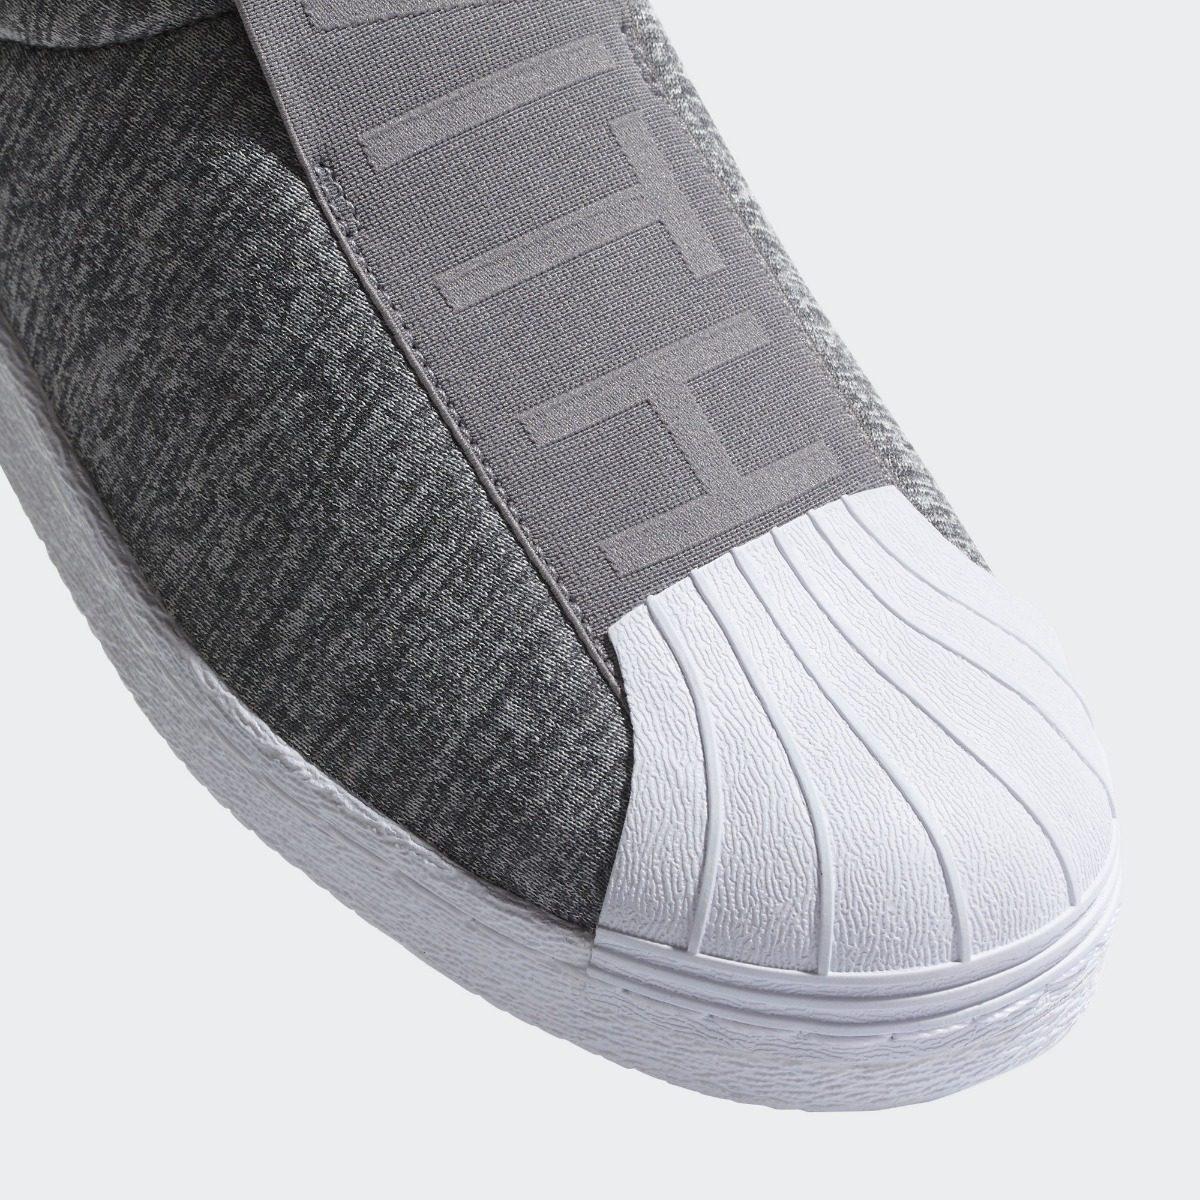 ... Tênis Adidas Superstar 55ea9baafe5bd1  adidas Superstar Slip On -  Original - R 319 97c0bccd73264